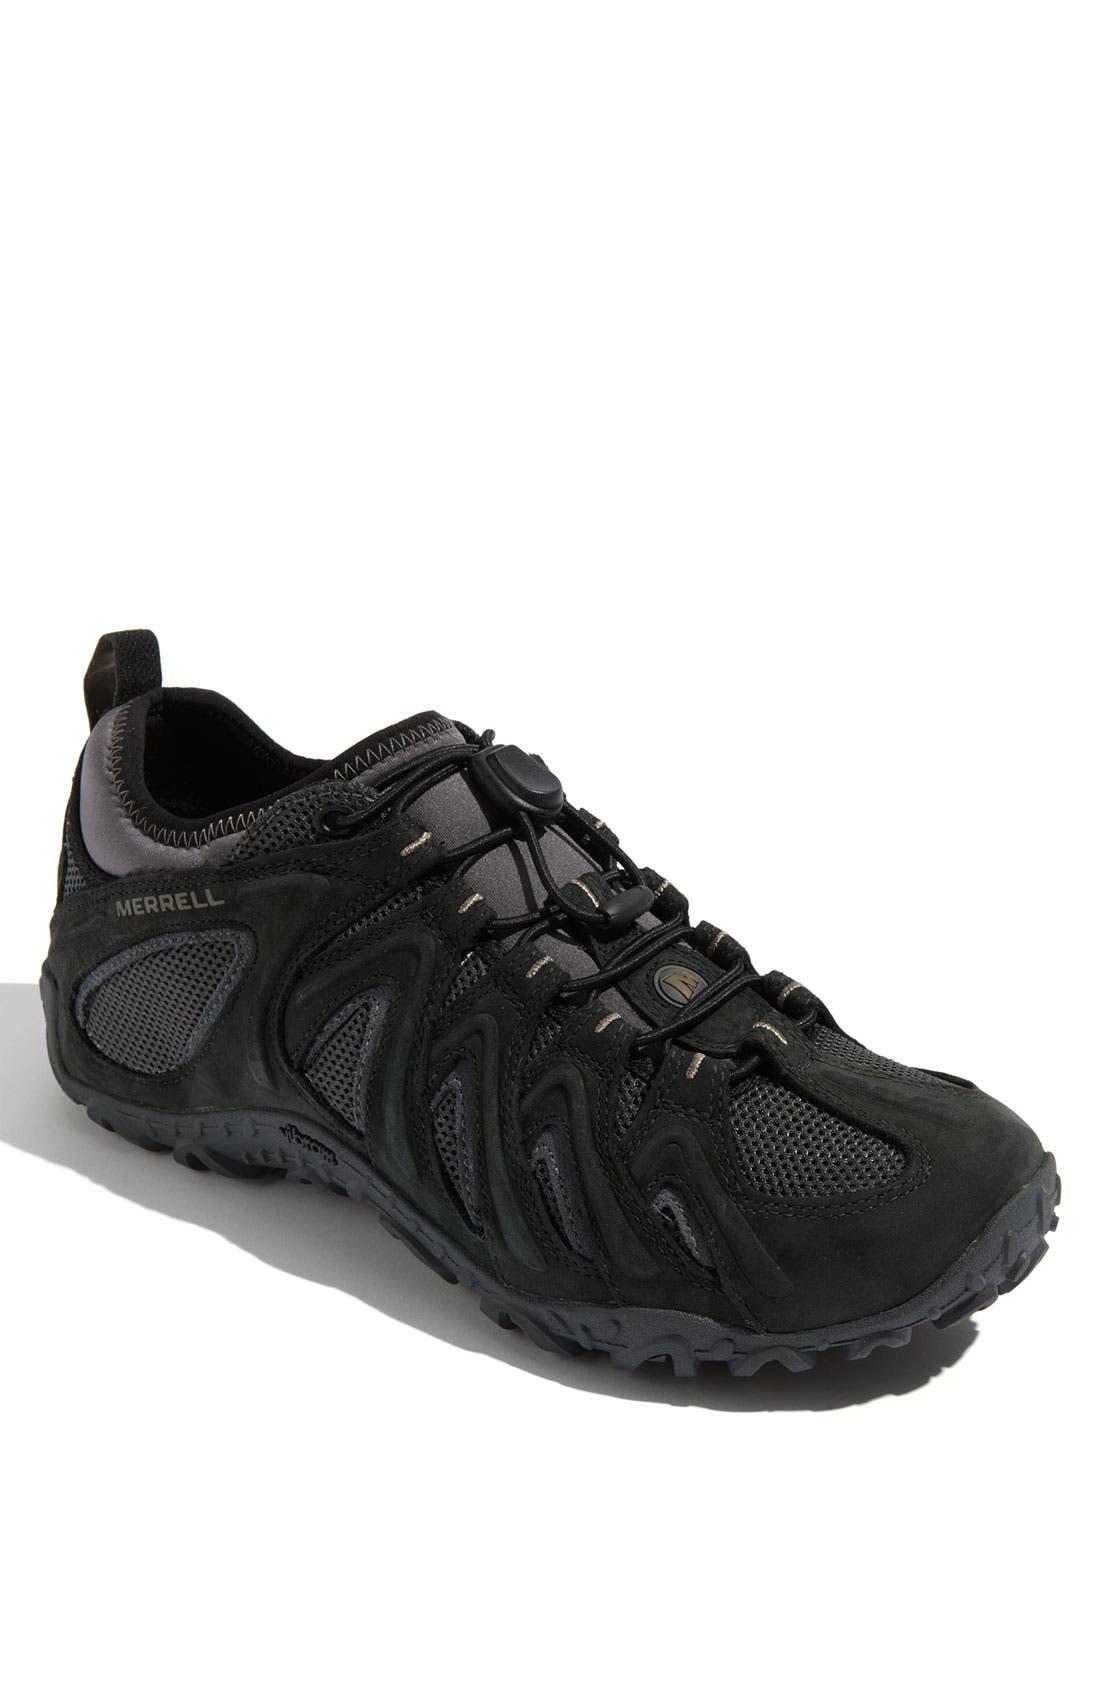 Main Image - Merrell 'Chameleon 4 Stretch' Hiking Shoe (Men) (Online Only)